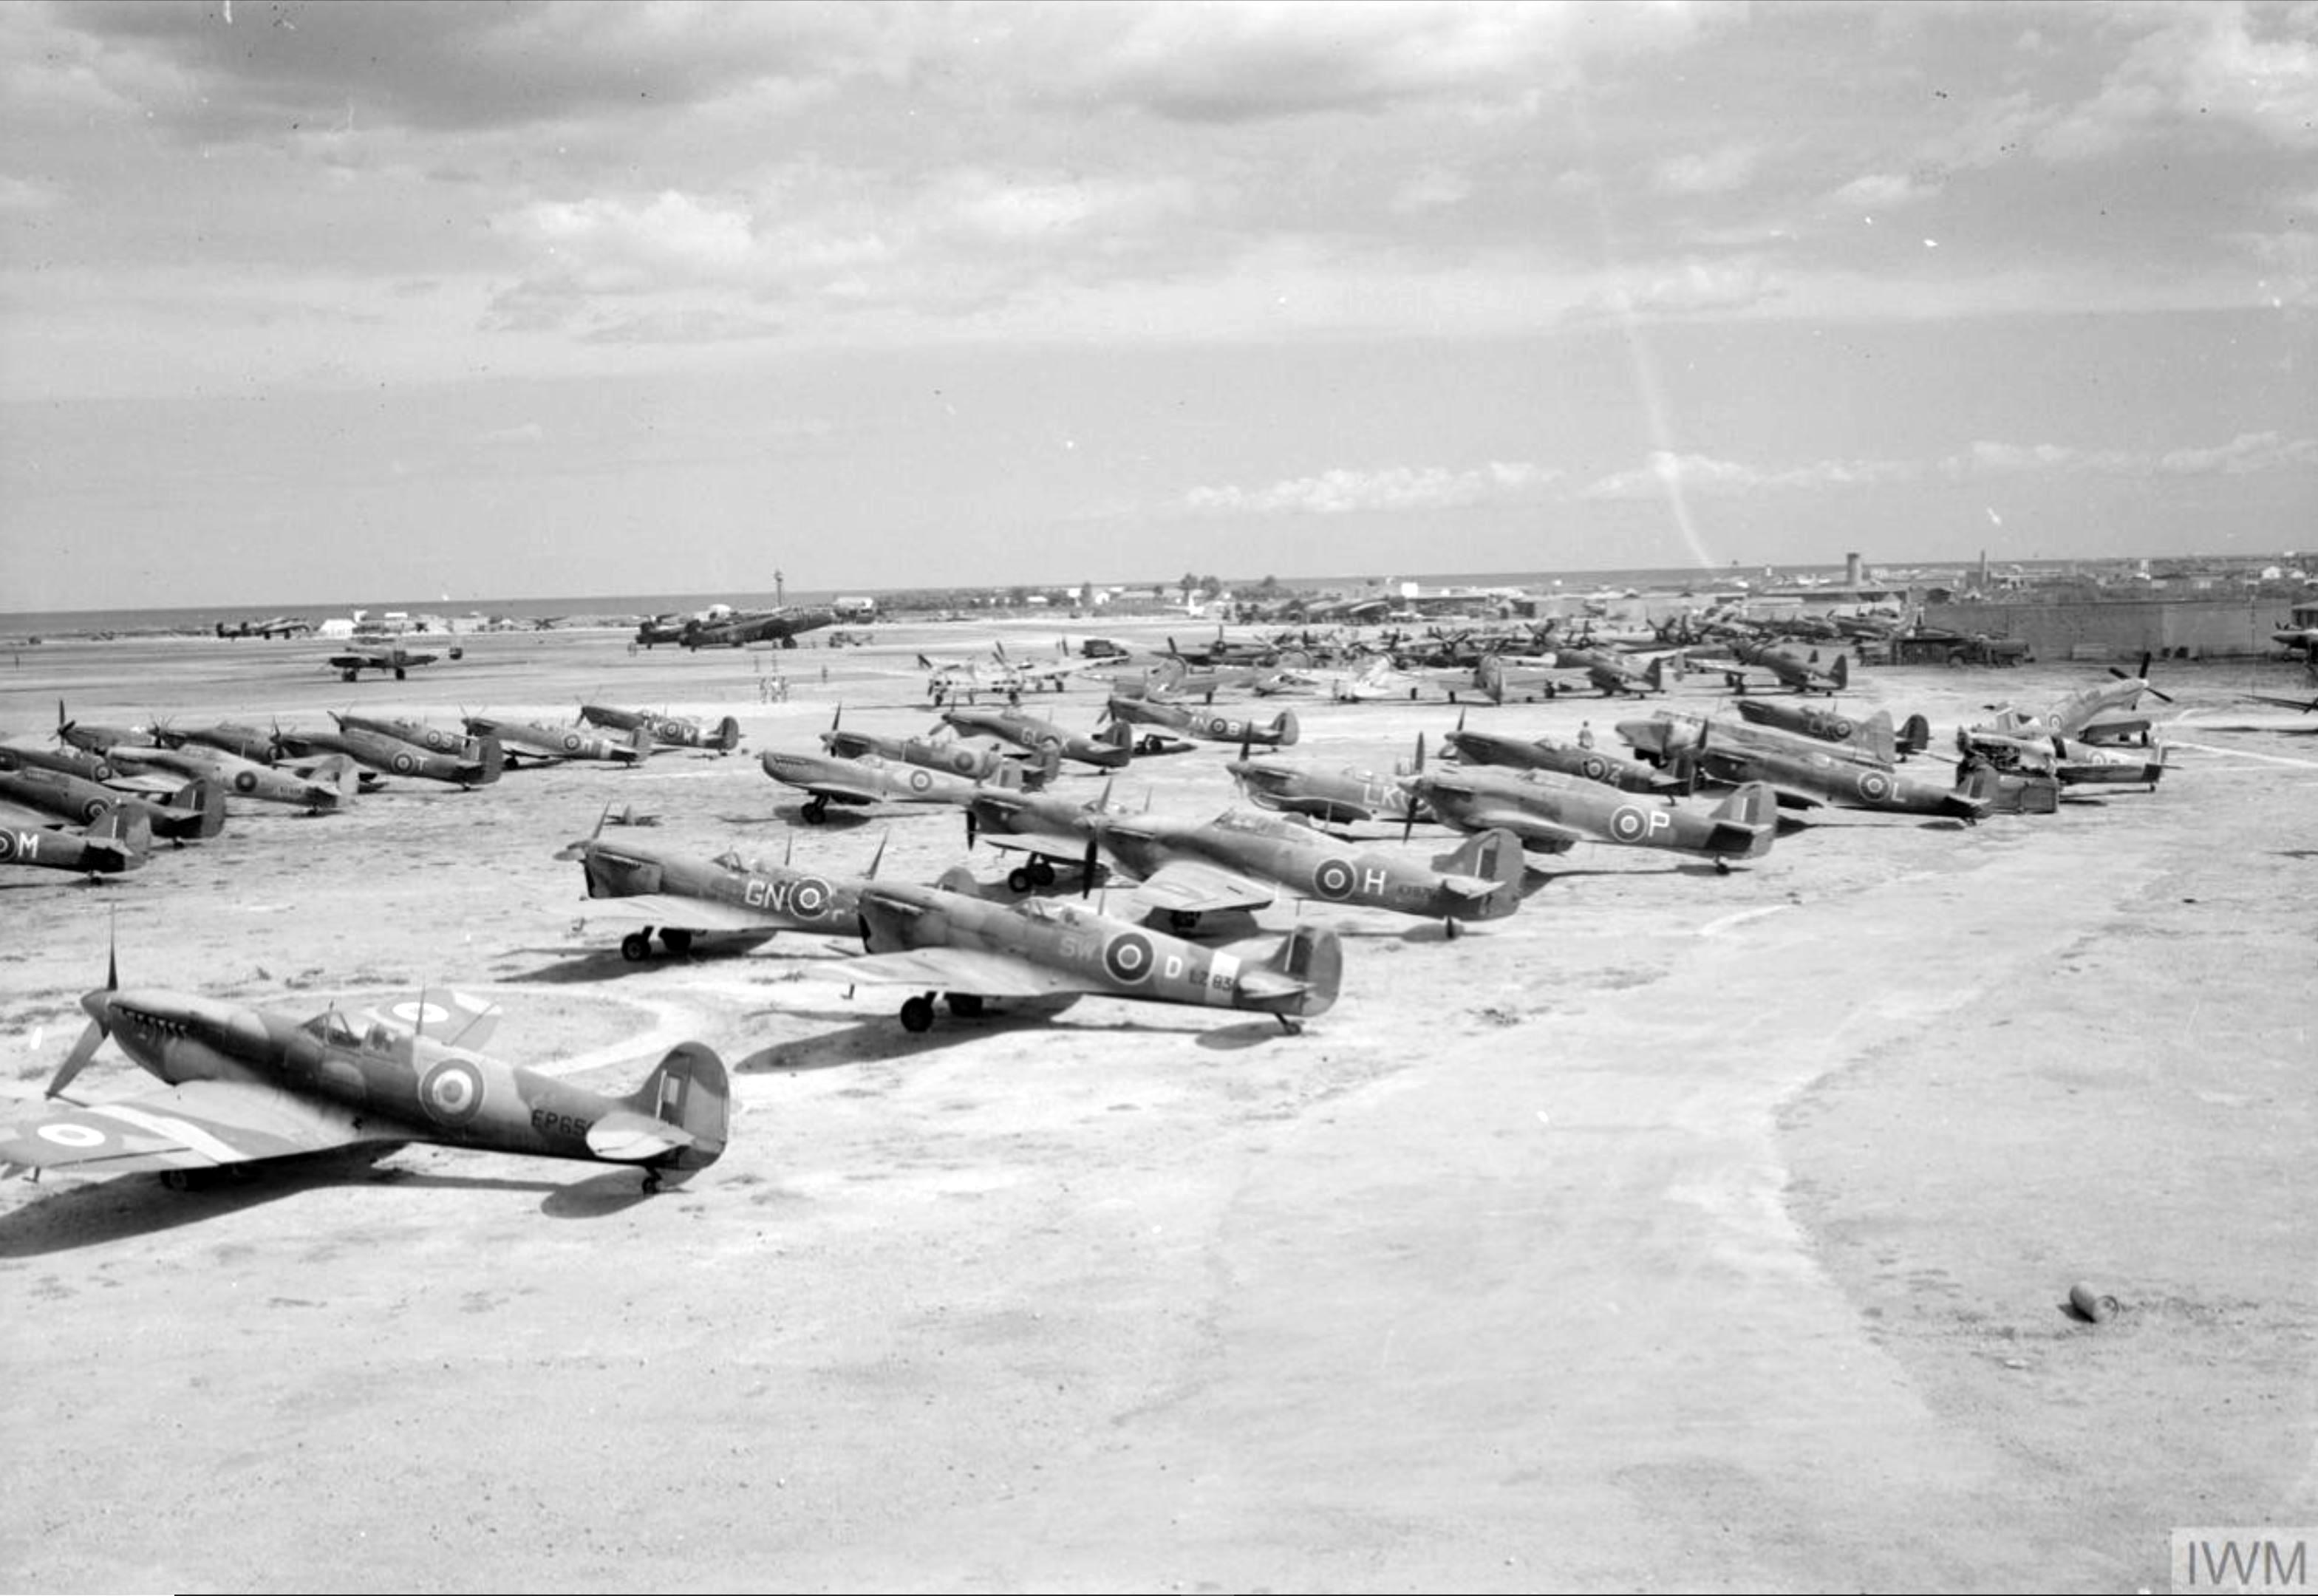 Hurricanes at RAF 110 Maintenance Unit with 185Sqn GLK Brindisi Italy 1943 IWM CNA3285